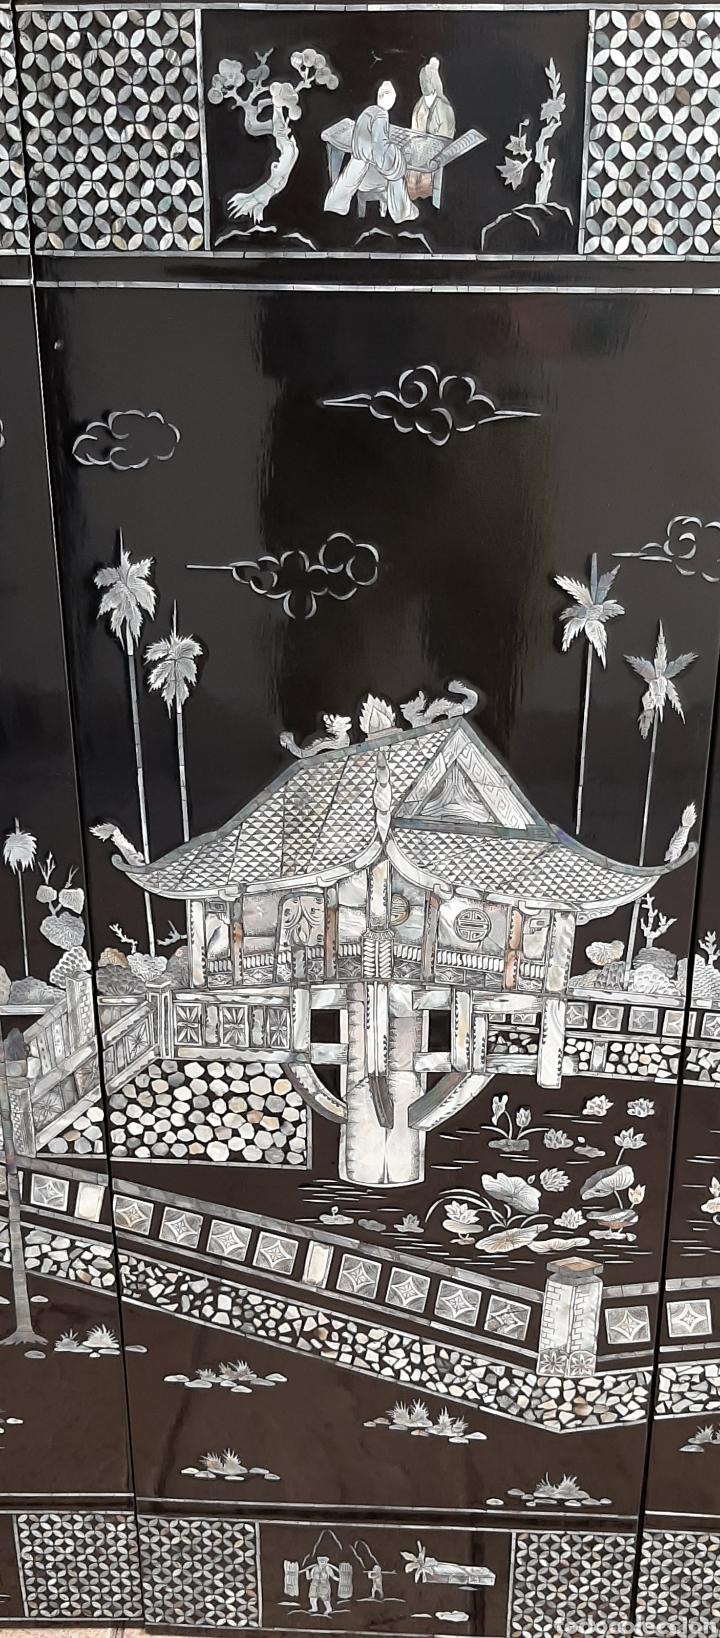 Arte: PAISAJE CHINO. 4 PANELES DE MADERA LACADA Y NÁCAR. - Foto 4 - 211910605